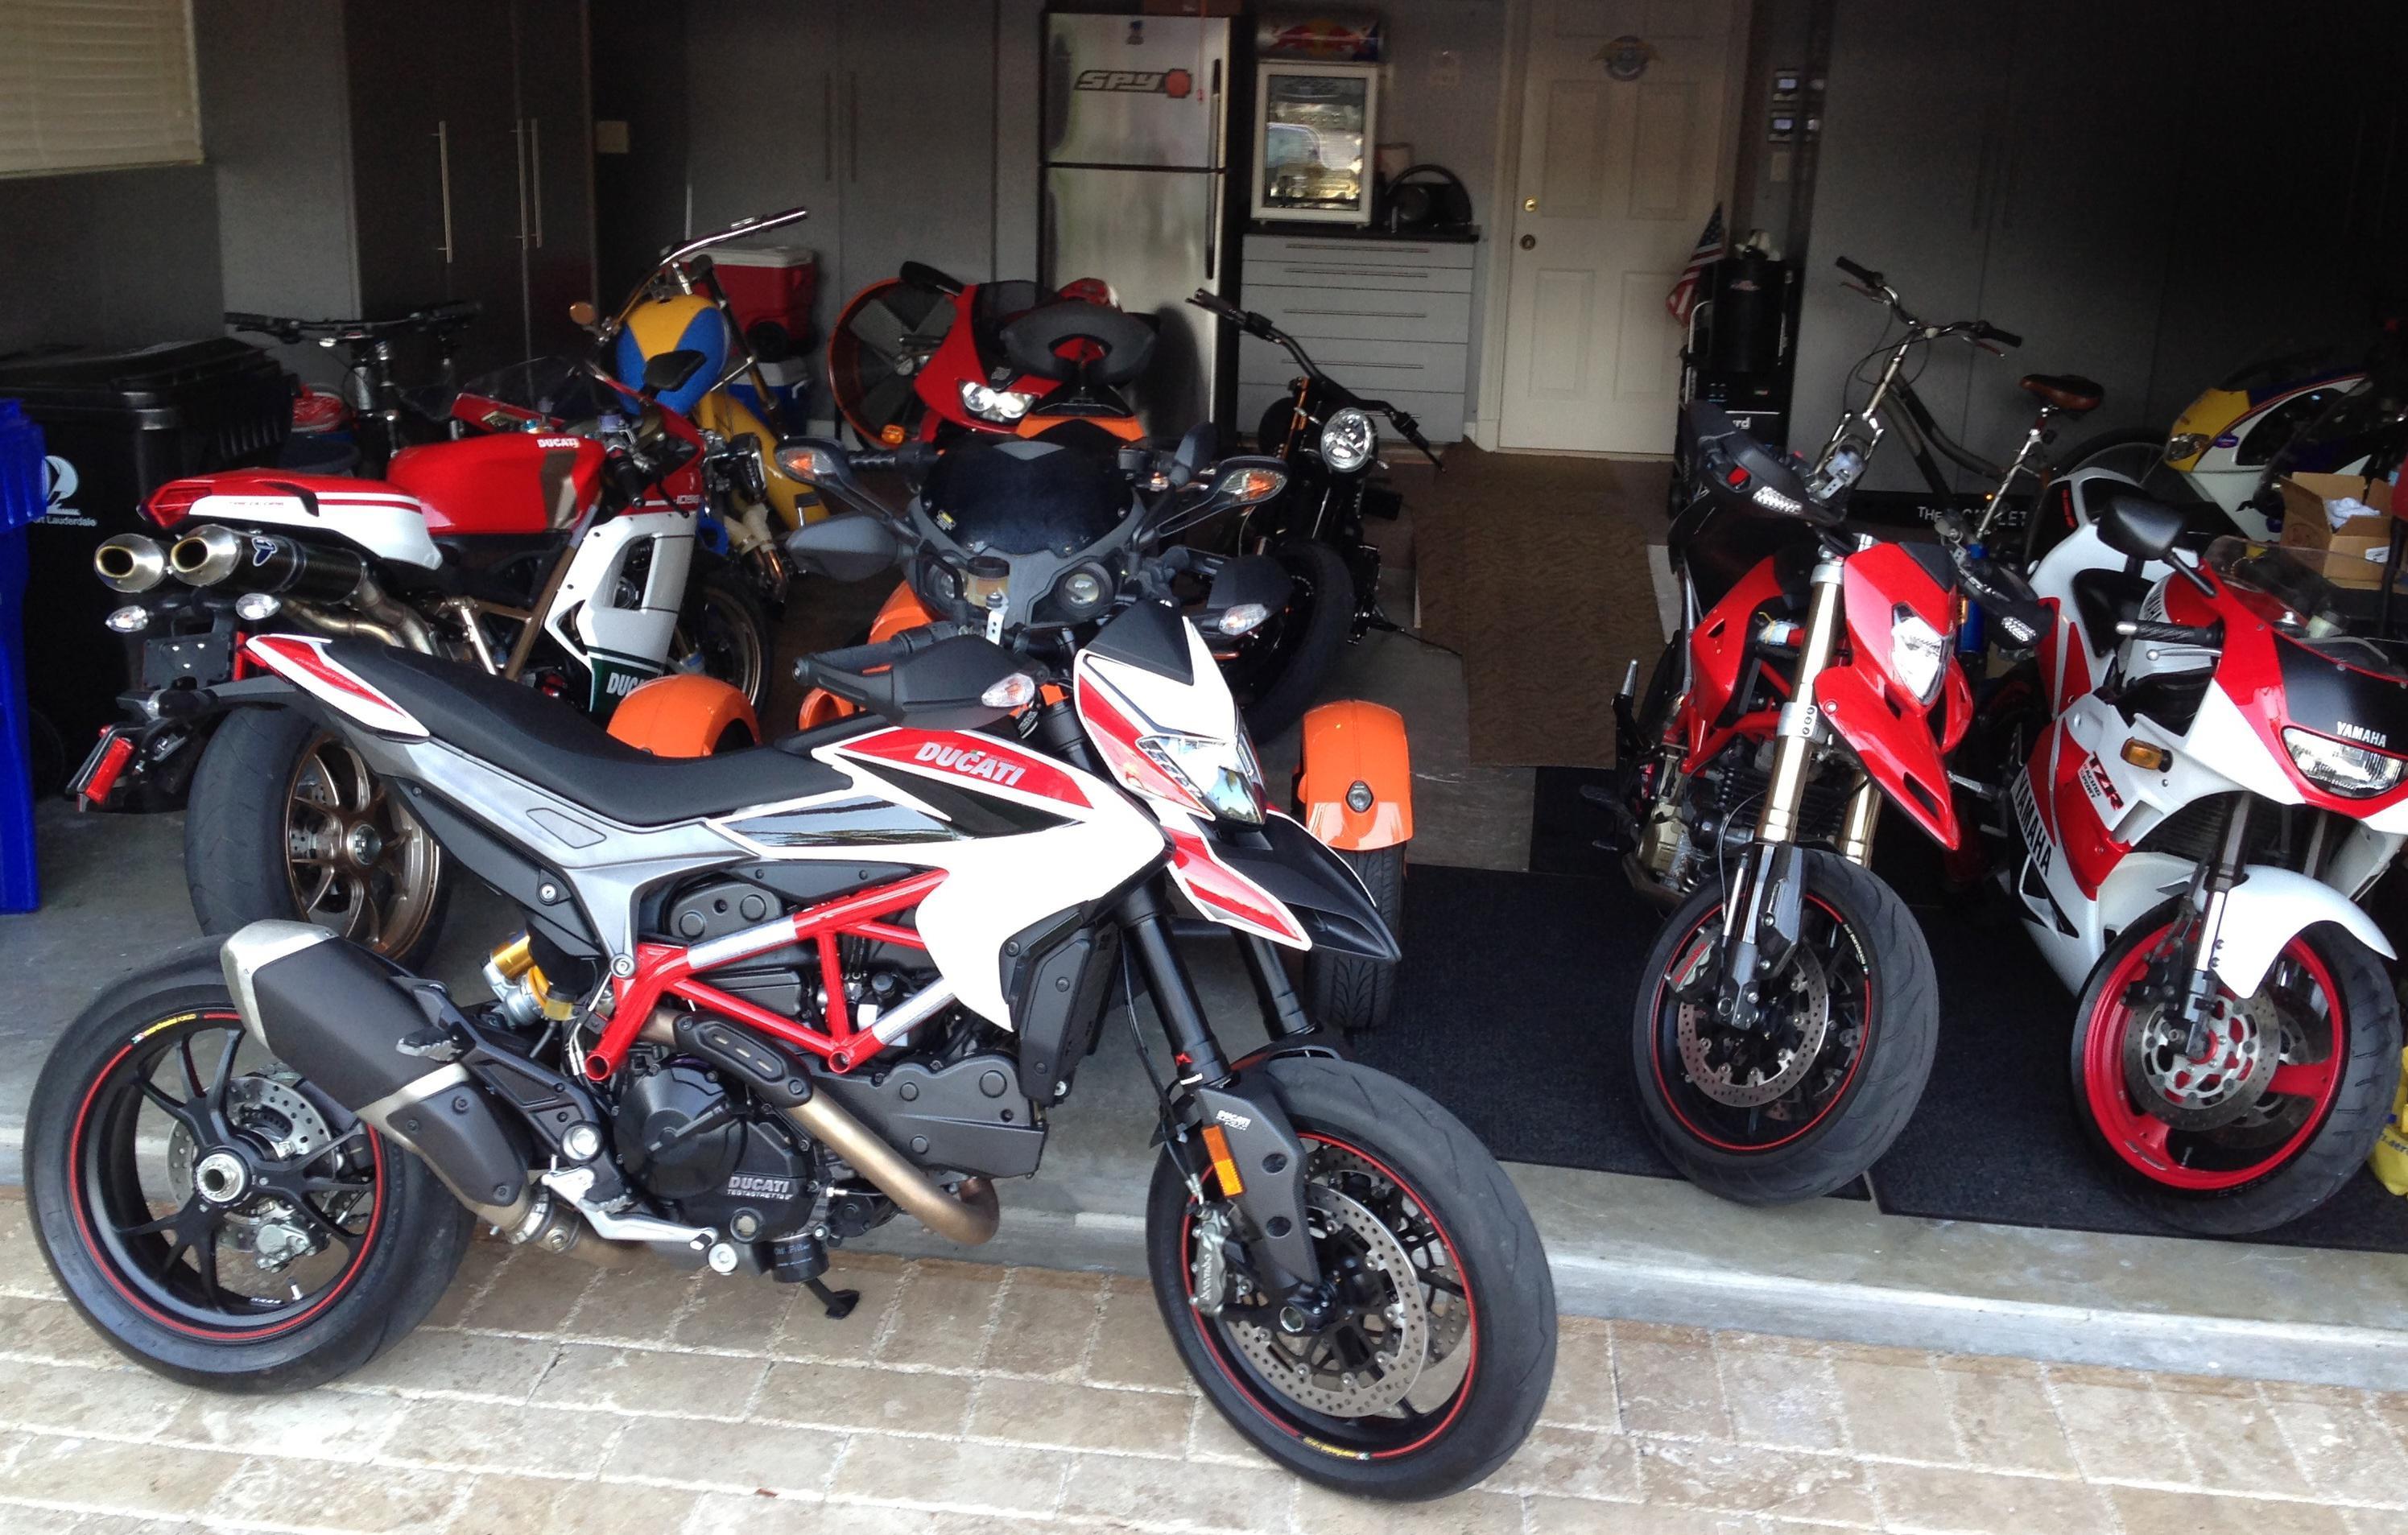 Ducati Hypermotard For Sale идеи изображения мотоцикла